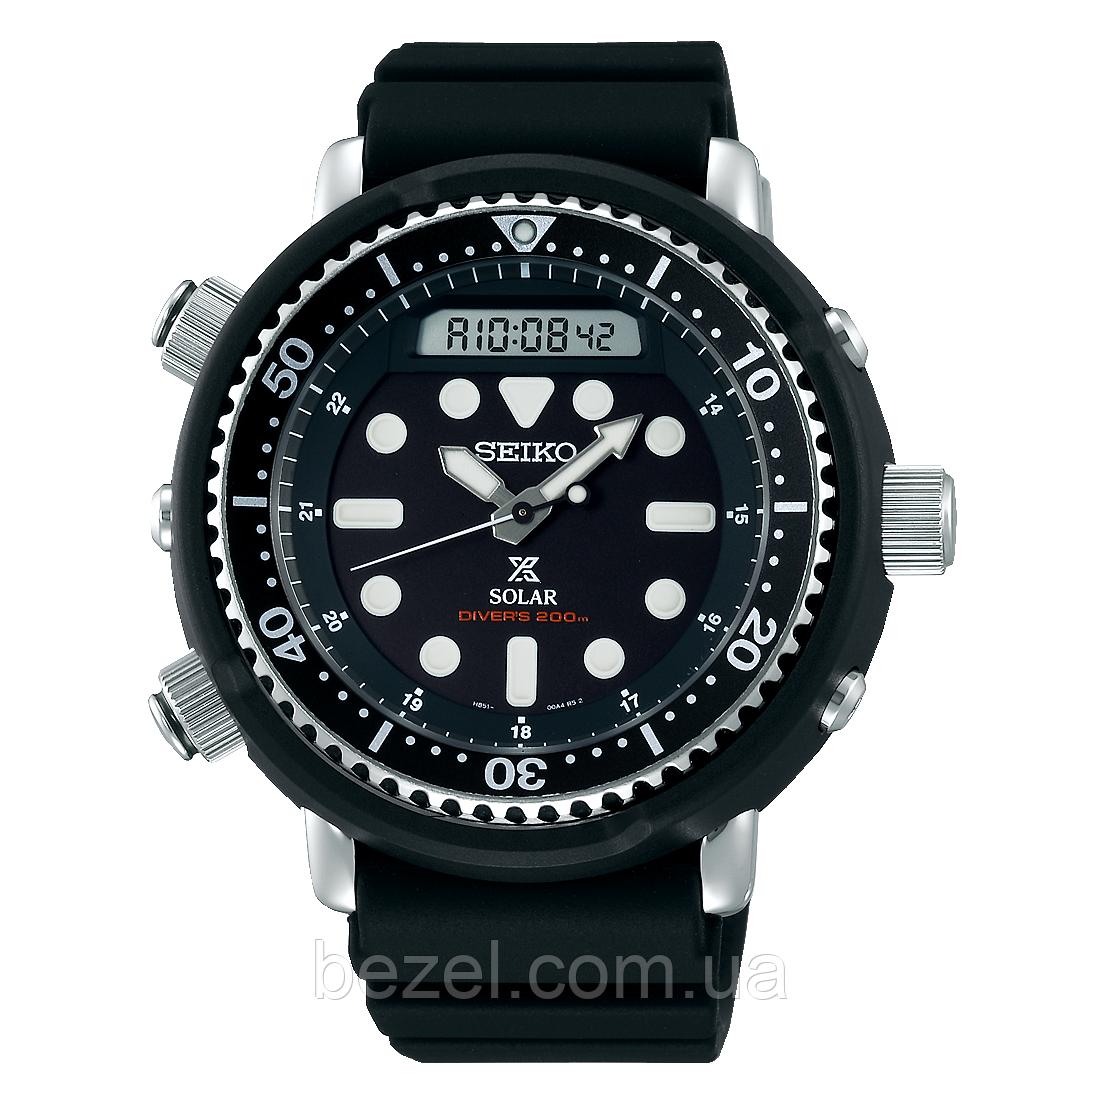 Мужские часы Seiko SNJ025 SNJ025P1 SBEQ001 Prospex Arnie Divers Solar